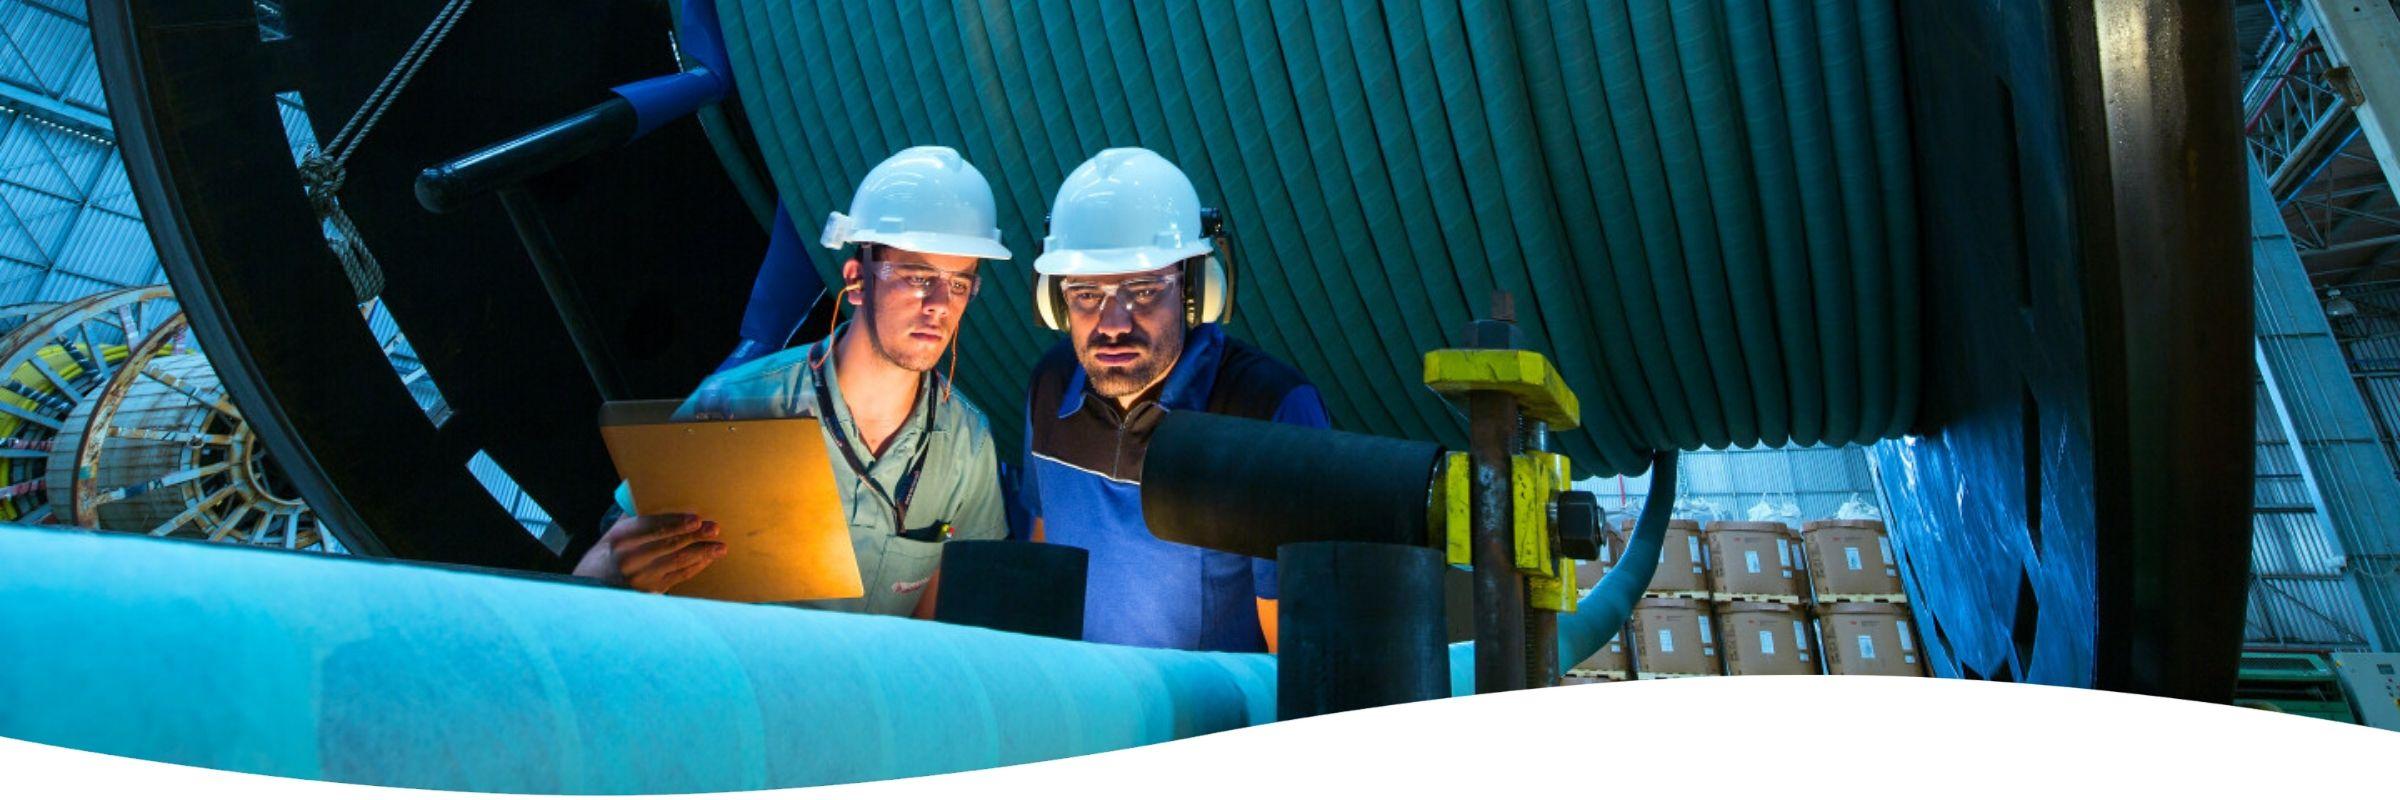 TÜV Rheinland Blog Energie & Technik